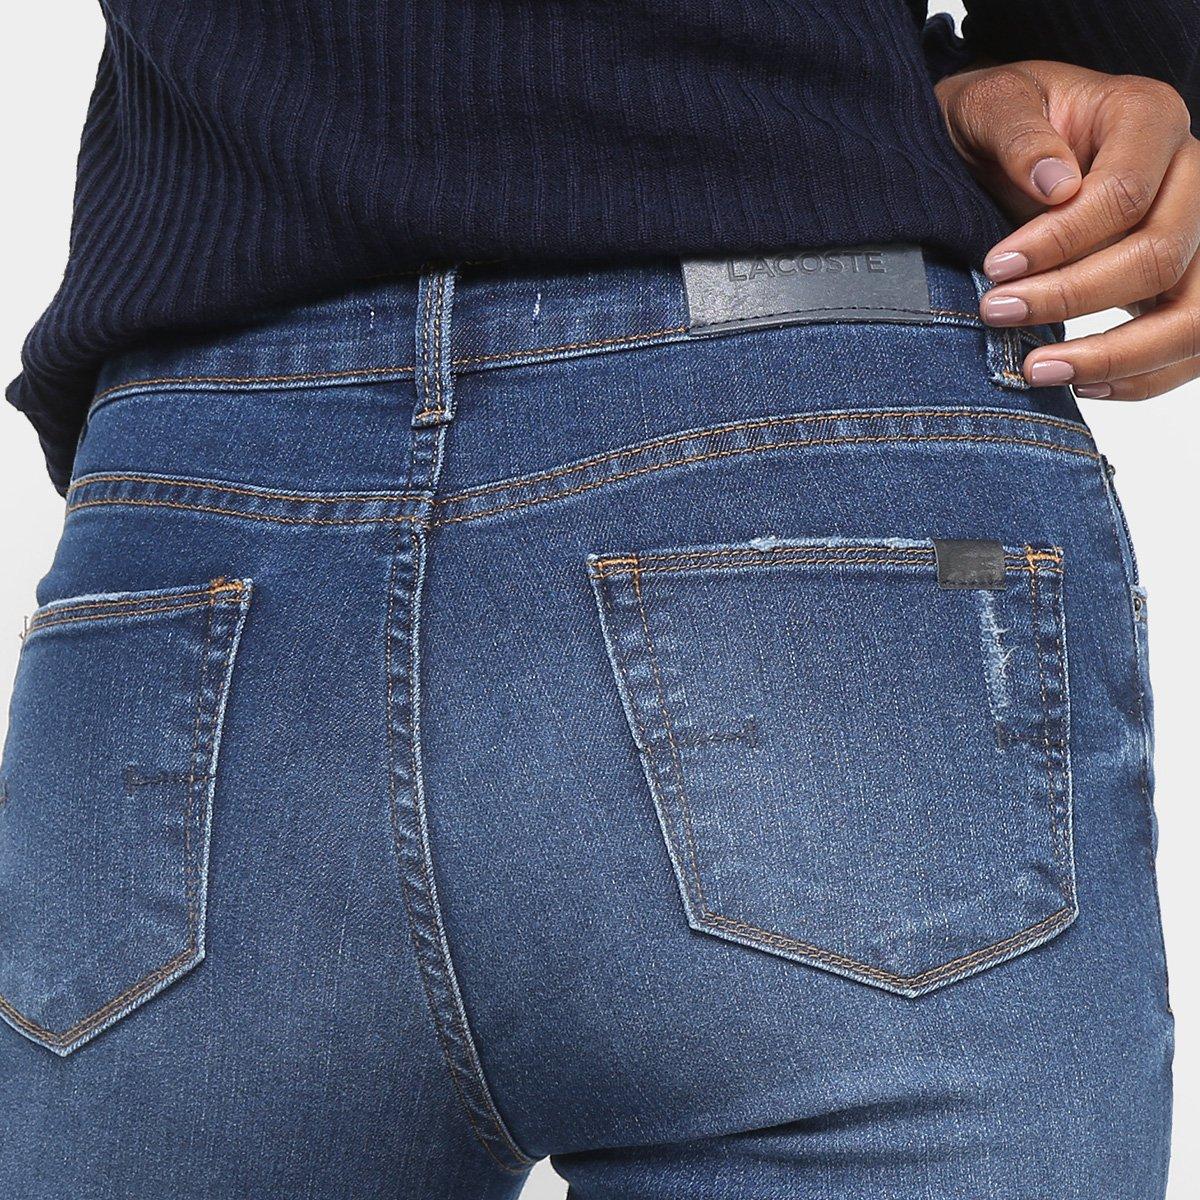 Calça Jeans Flare Lacoste Estonada Cintura Alta Feminina - Compre ... 92512e4784